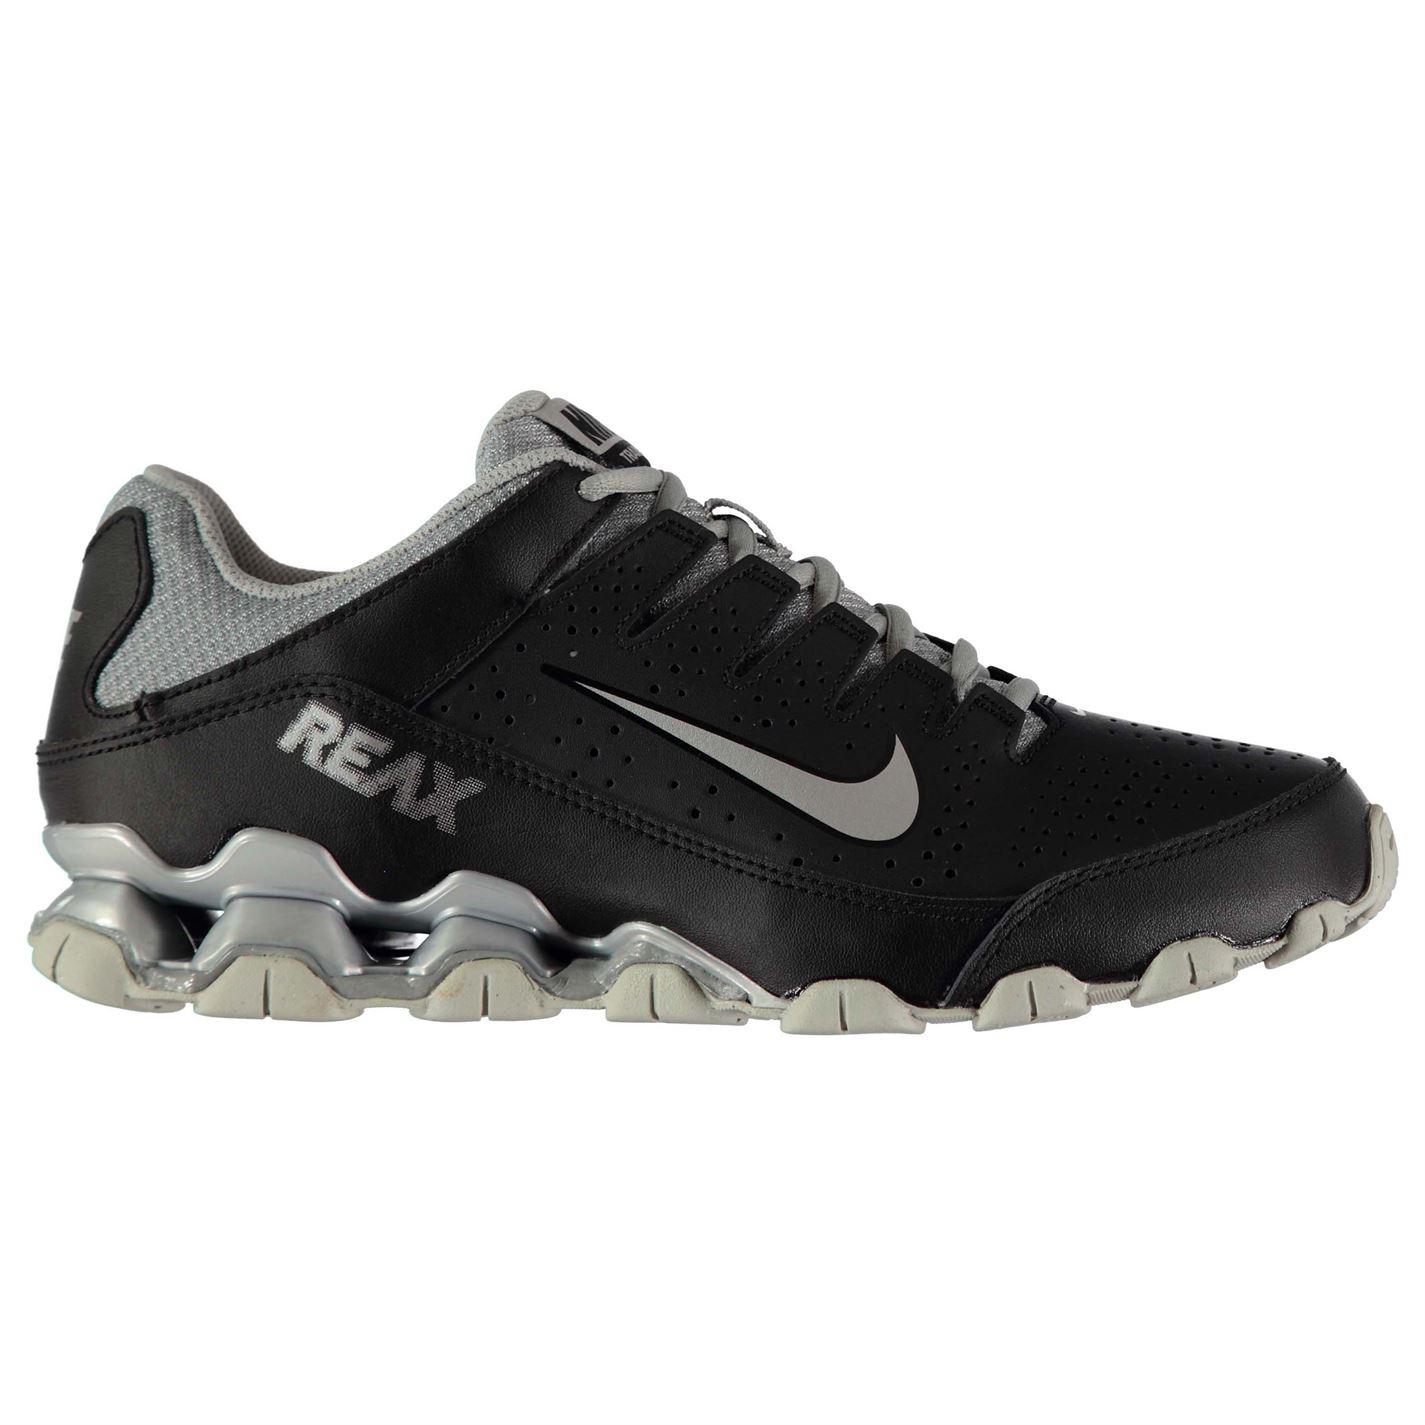 b08308d090a Nike Reax 8 Tr Sn74 - Black/Silver с цена от лв - Sravni.bg